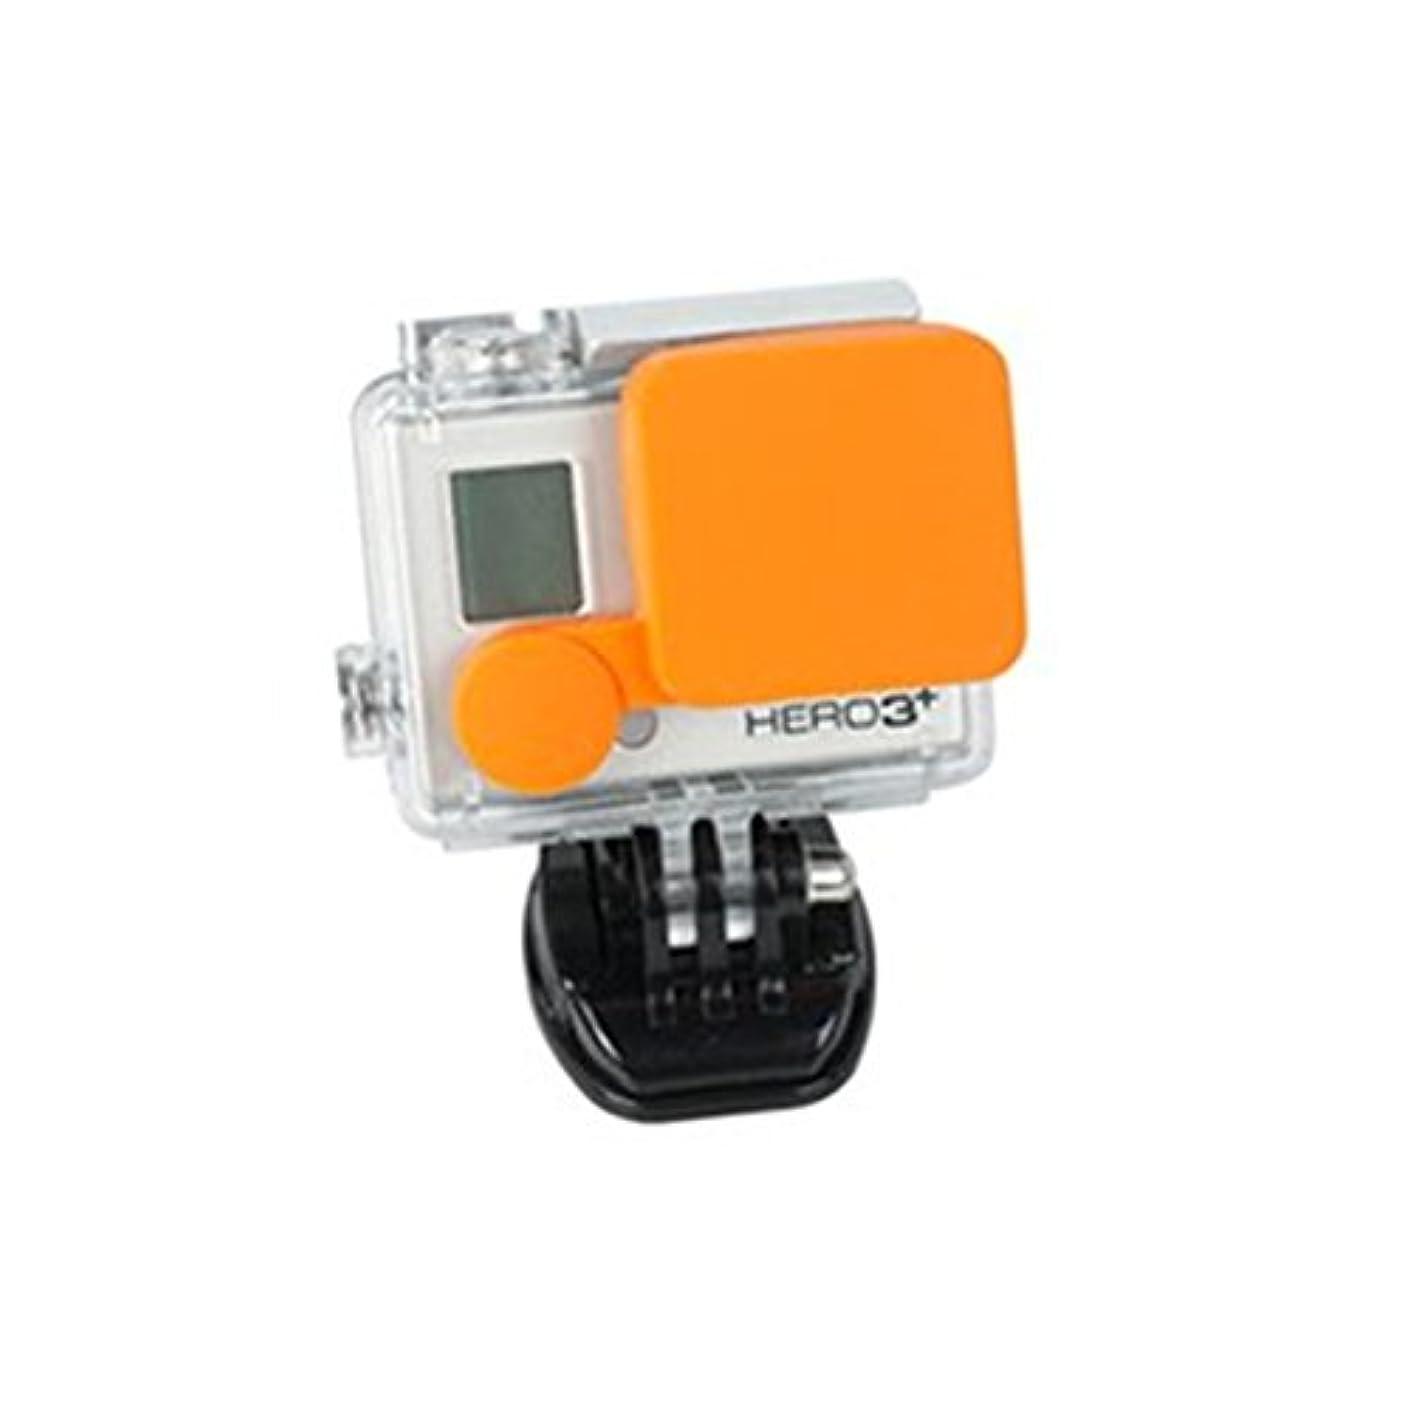 Darkhorse Protective Silicone Covers Lens Caps for GoPro Hero 3+, Hero 3 Plus, Hero 4 Camera and Housing - Orange